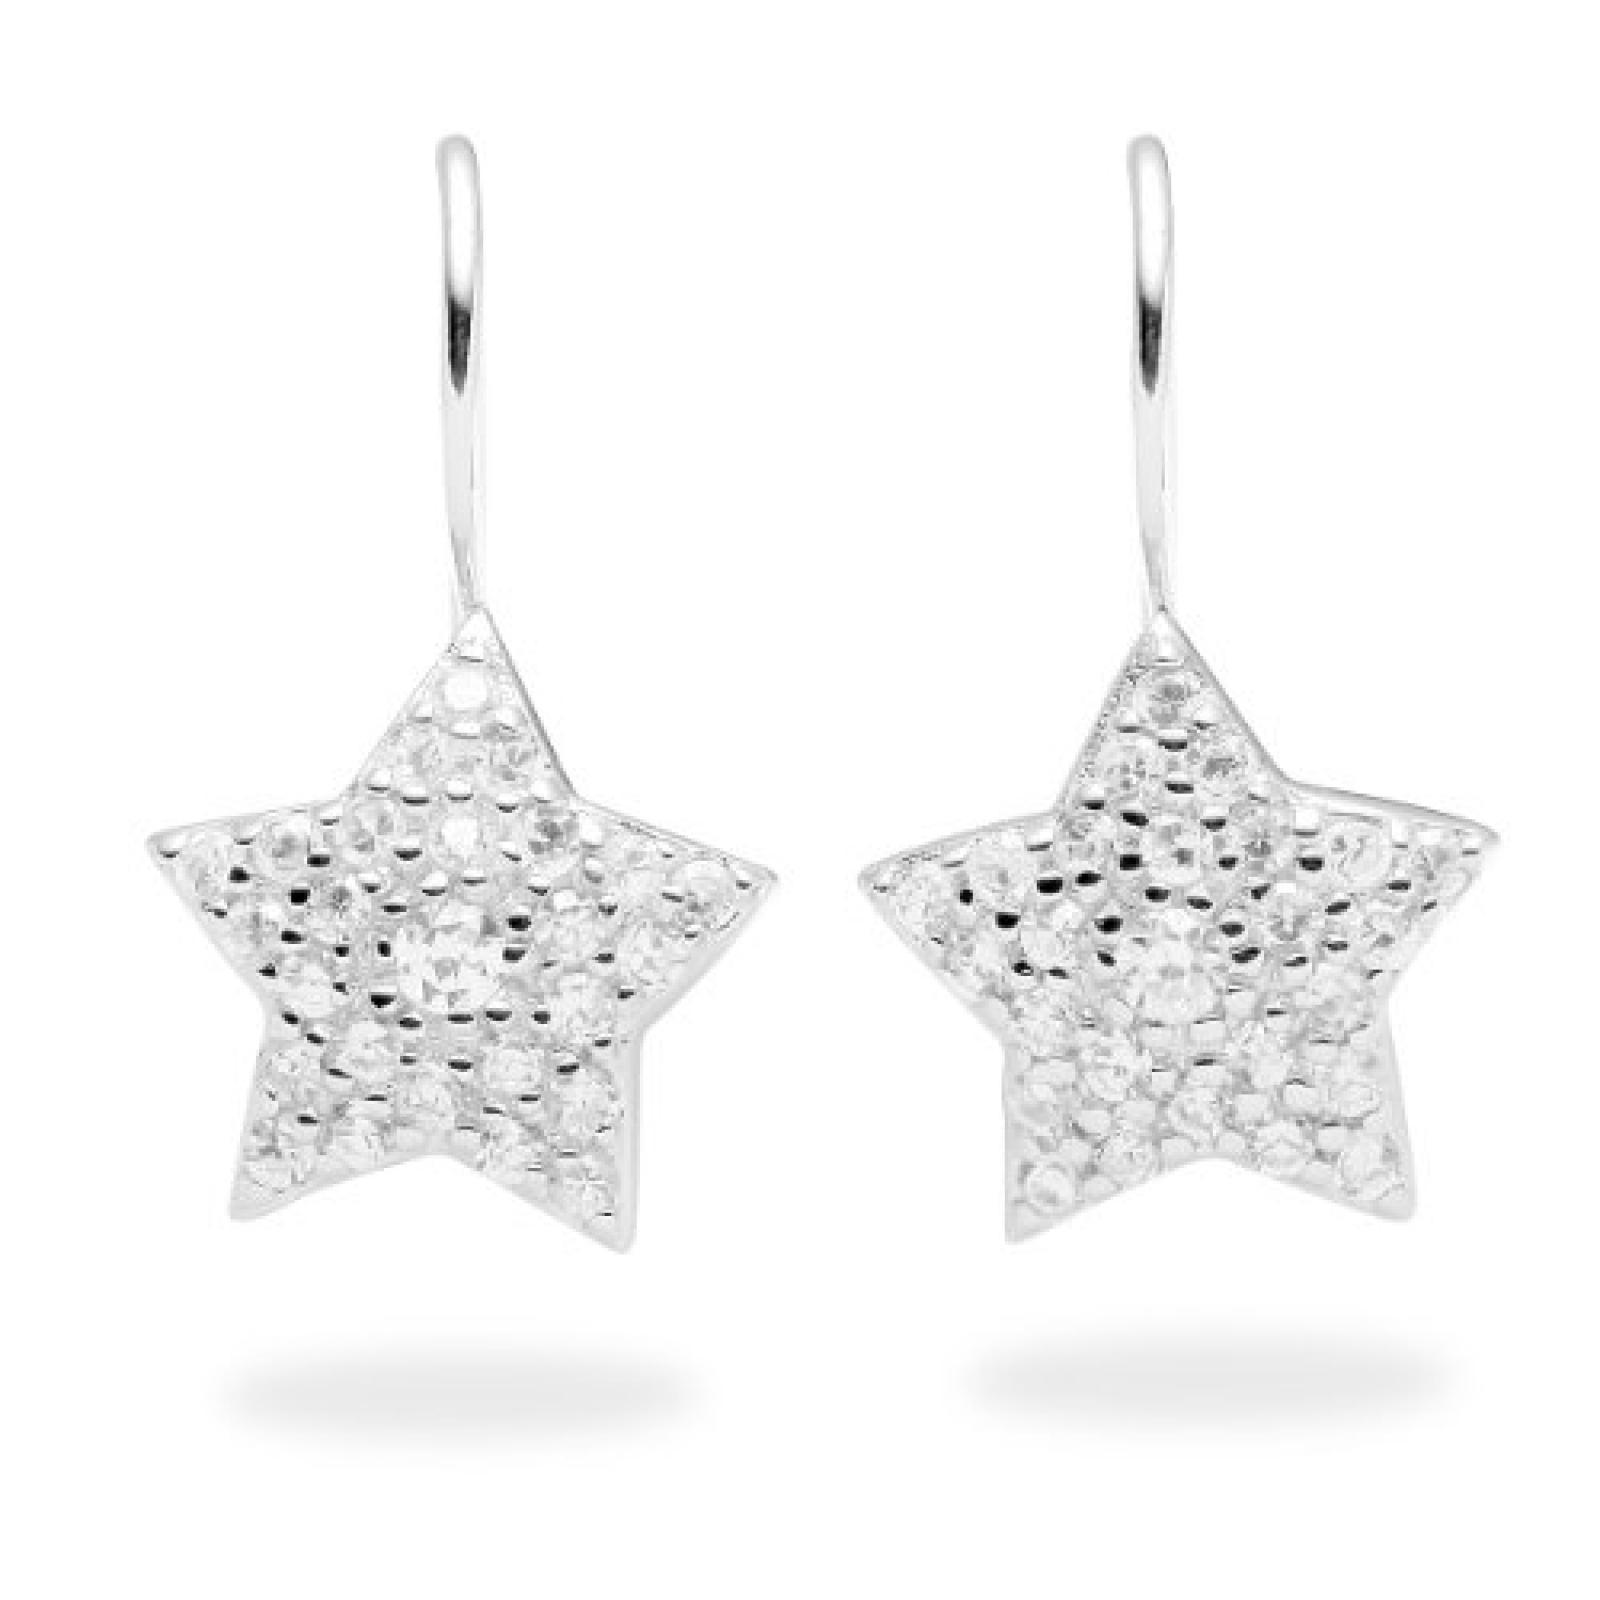 Rafaela Donata Damen-Ohrhänger Classic Collection 925 Sterling Silber Zirkonia weiß Sterne  60800020